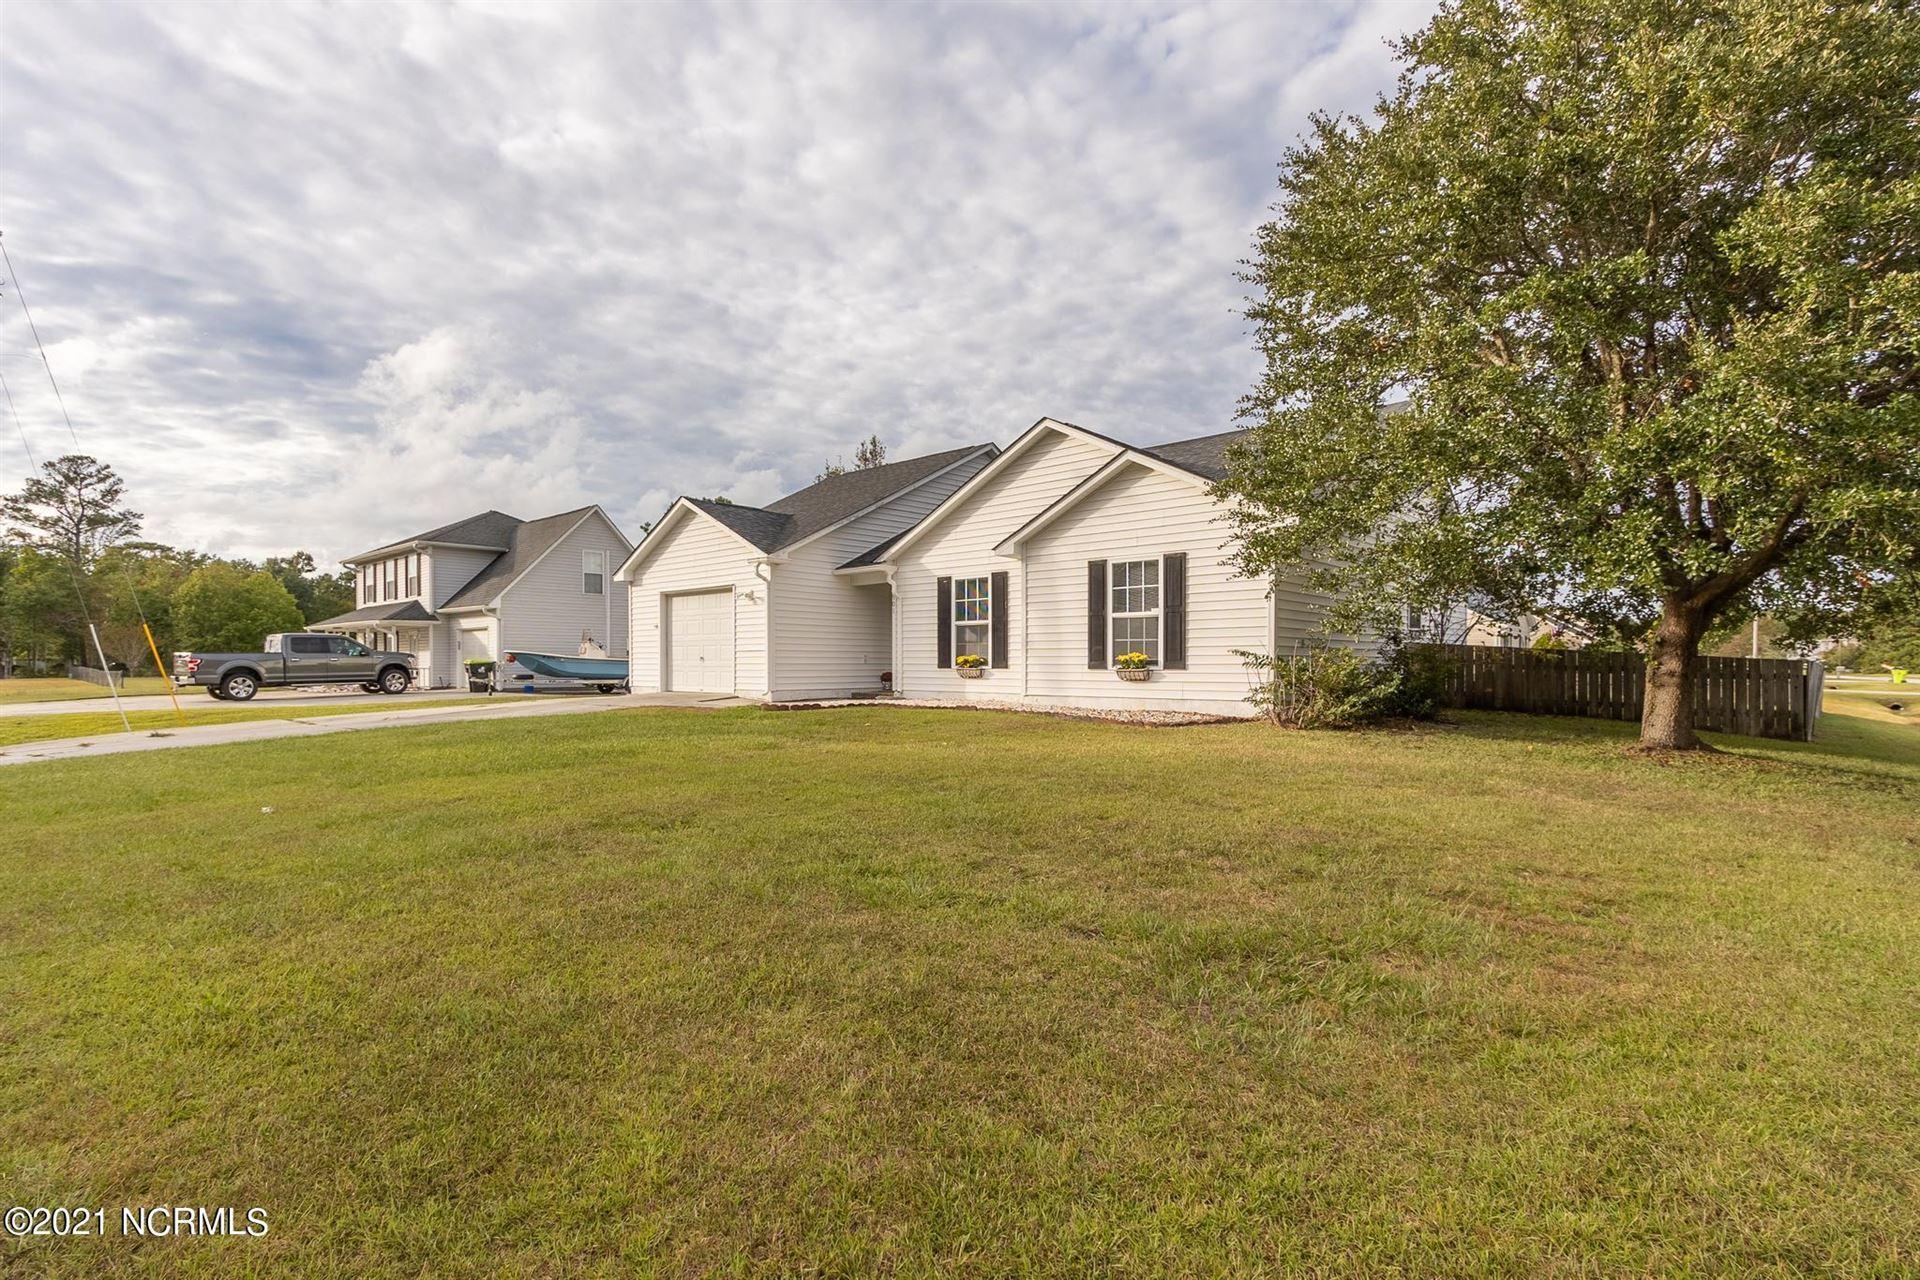 Photo of 901 Main St Ext, Swansboro, NC 28584 (MLS # 100294044)